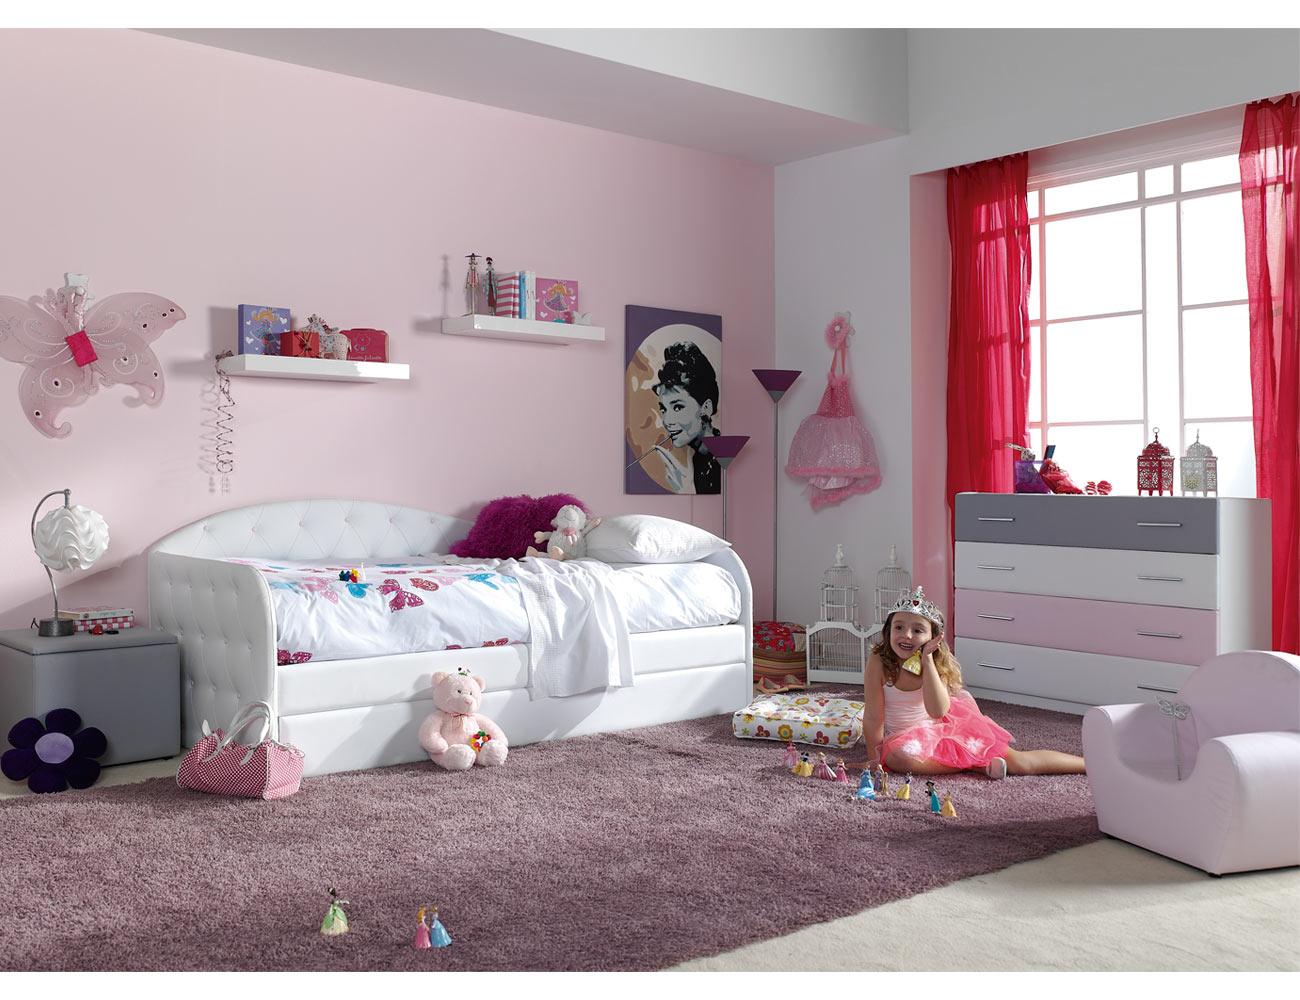 243 cama nido7